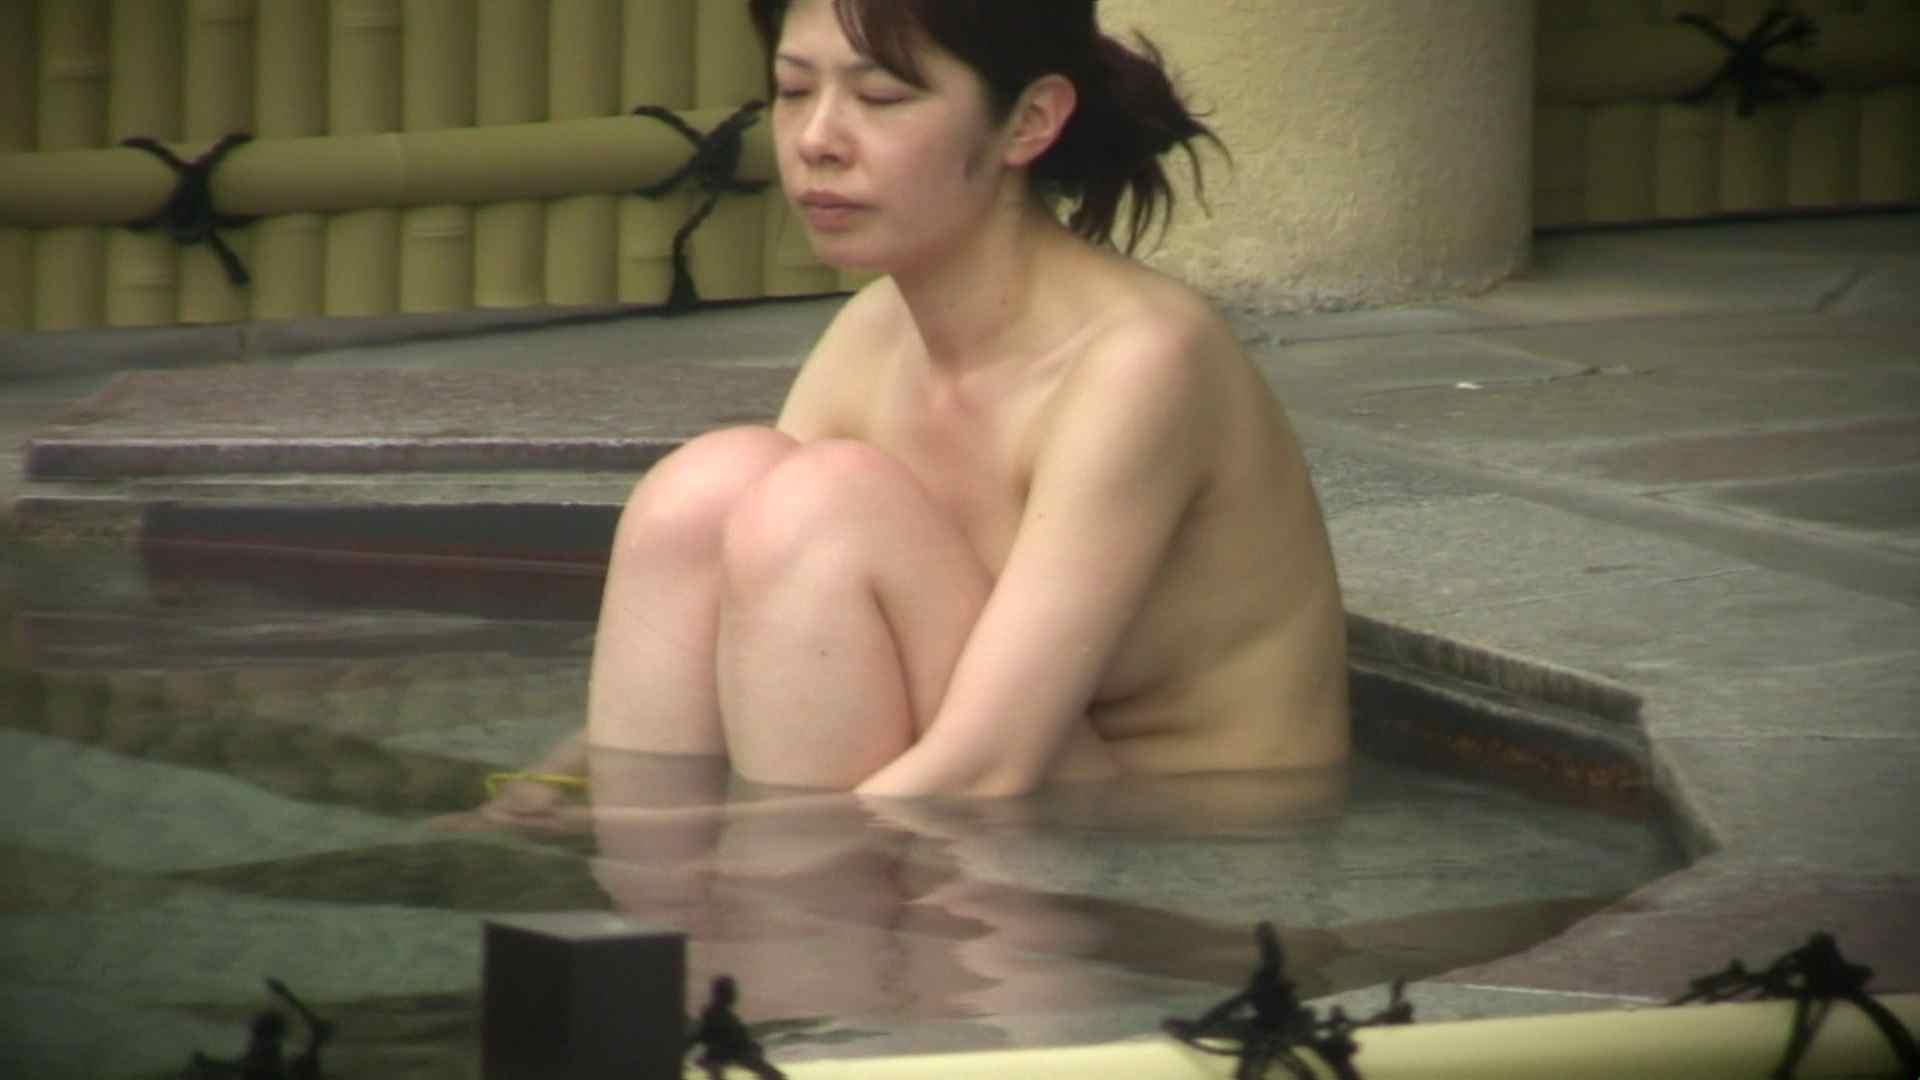 Aquaな露天風呂Vol.676 盗撮シリーズ | 露天風呂編  83PIX 25